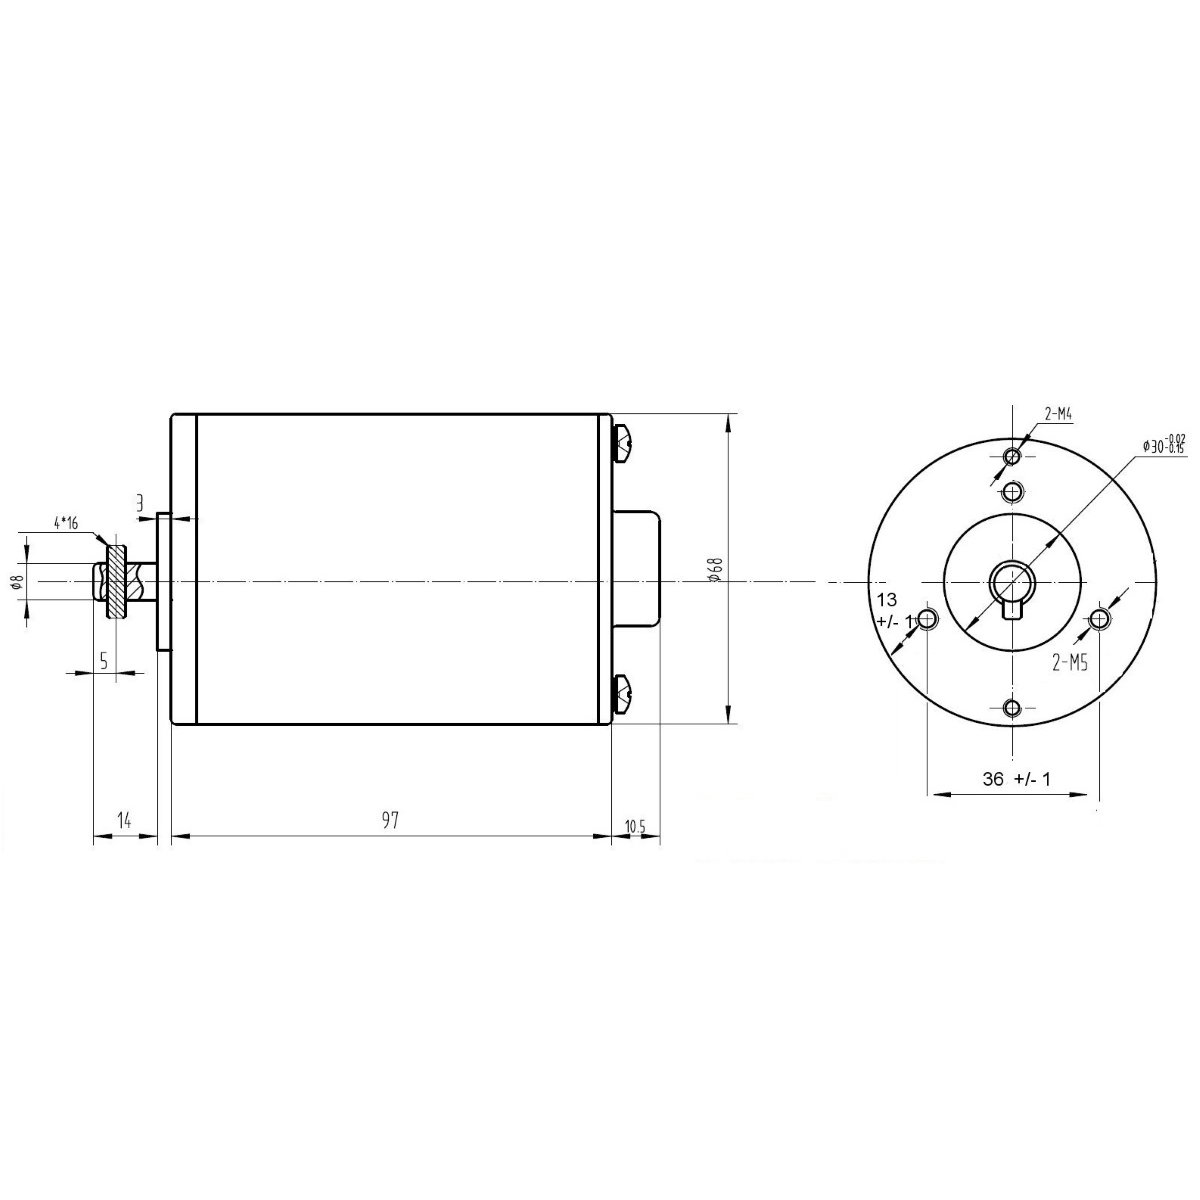 Dimensional Drawing - MY6812 150W 24V 2750RPM DC Motor for E-bike Bicycle - ROBU